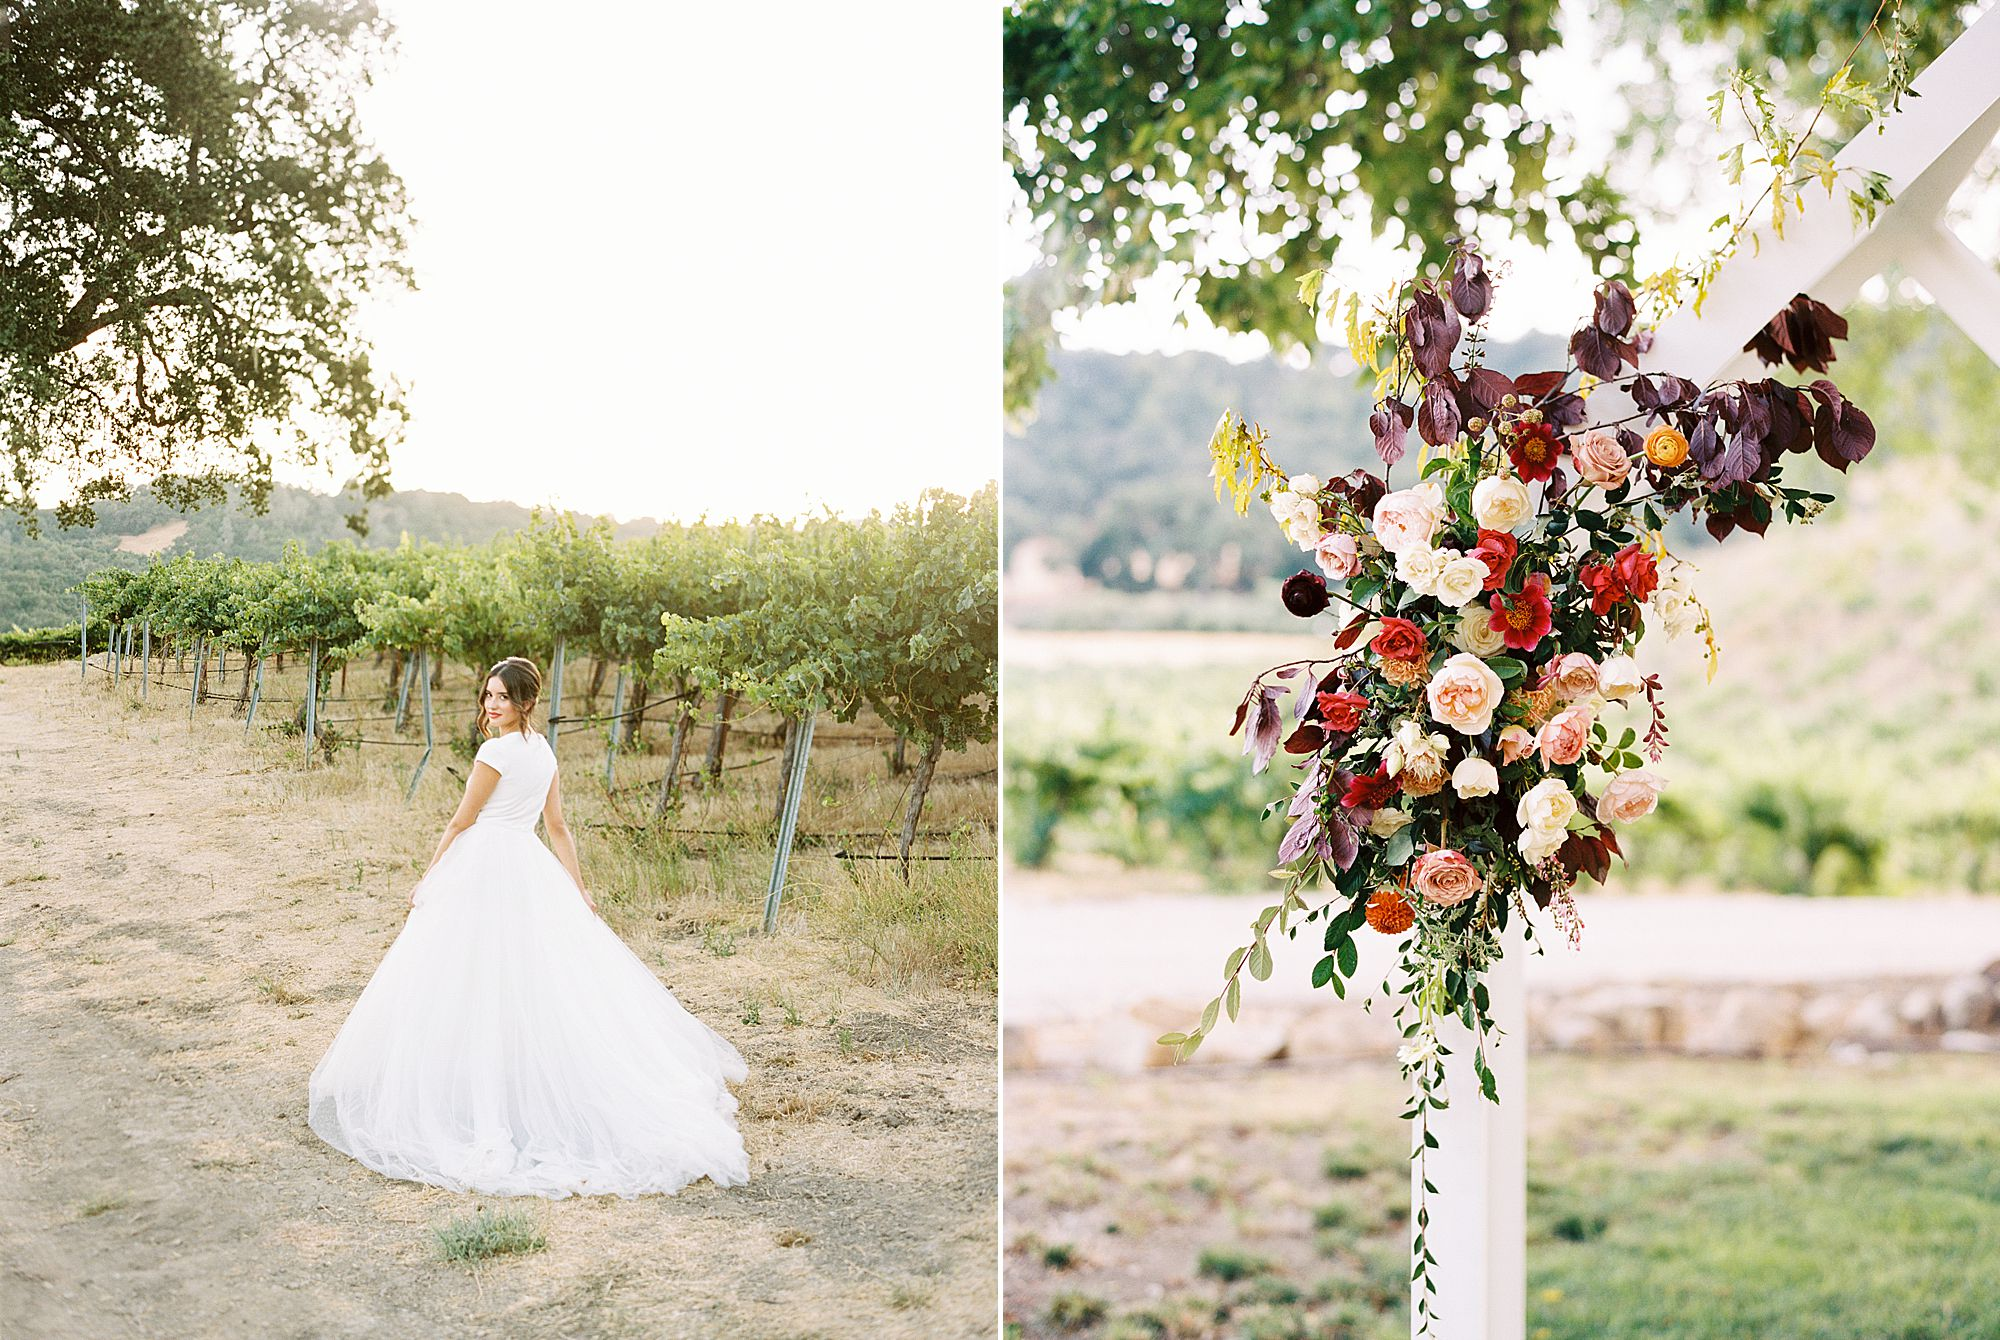 HammerSky Wedding Inspiration Featured on Hey Wedding Lady with Vanessa Noel Events - Ashley Baumgartner - SLO Wedding Photographer_0037.jpg